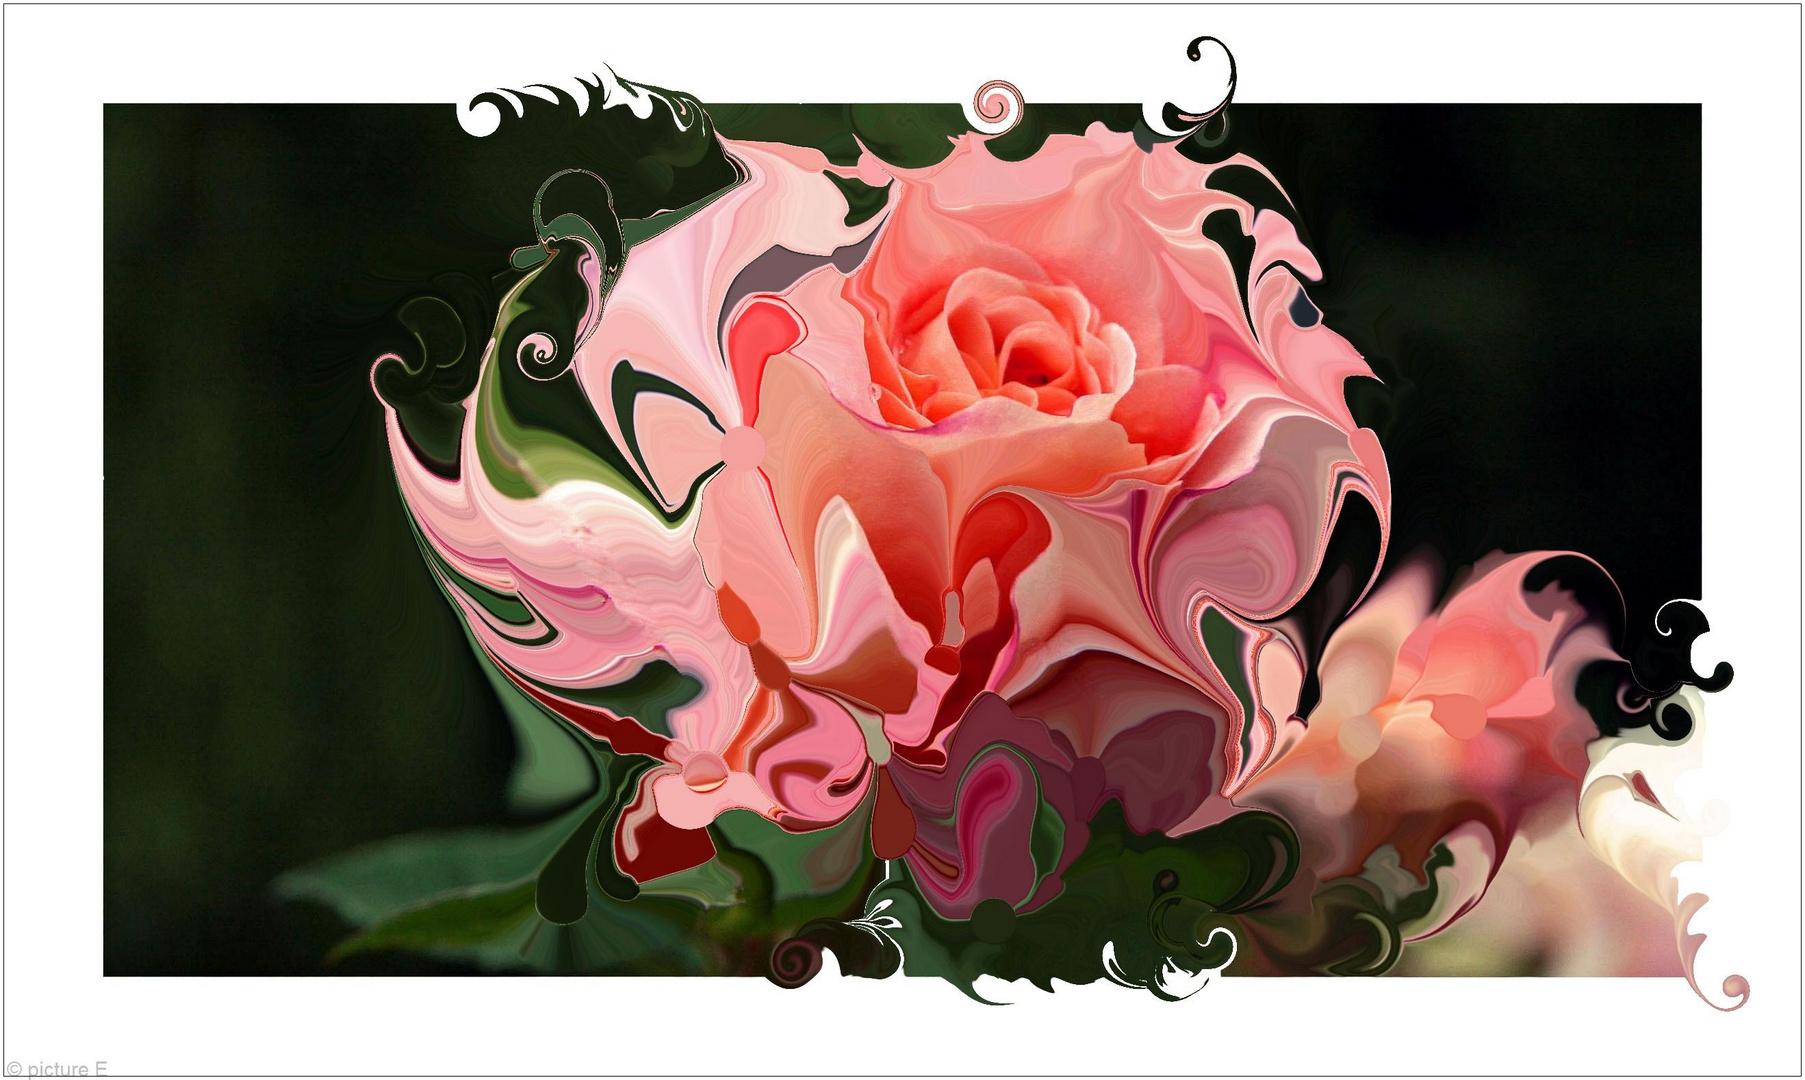 Die Rose der Rose